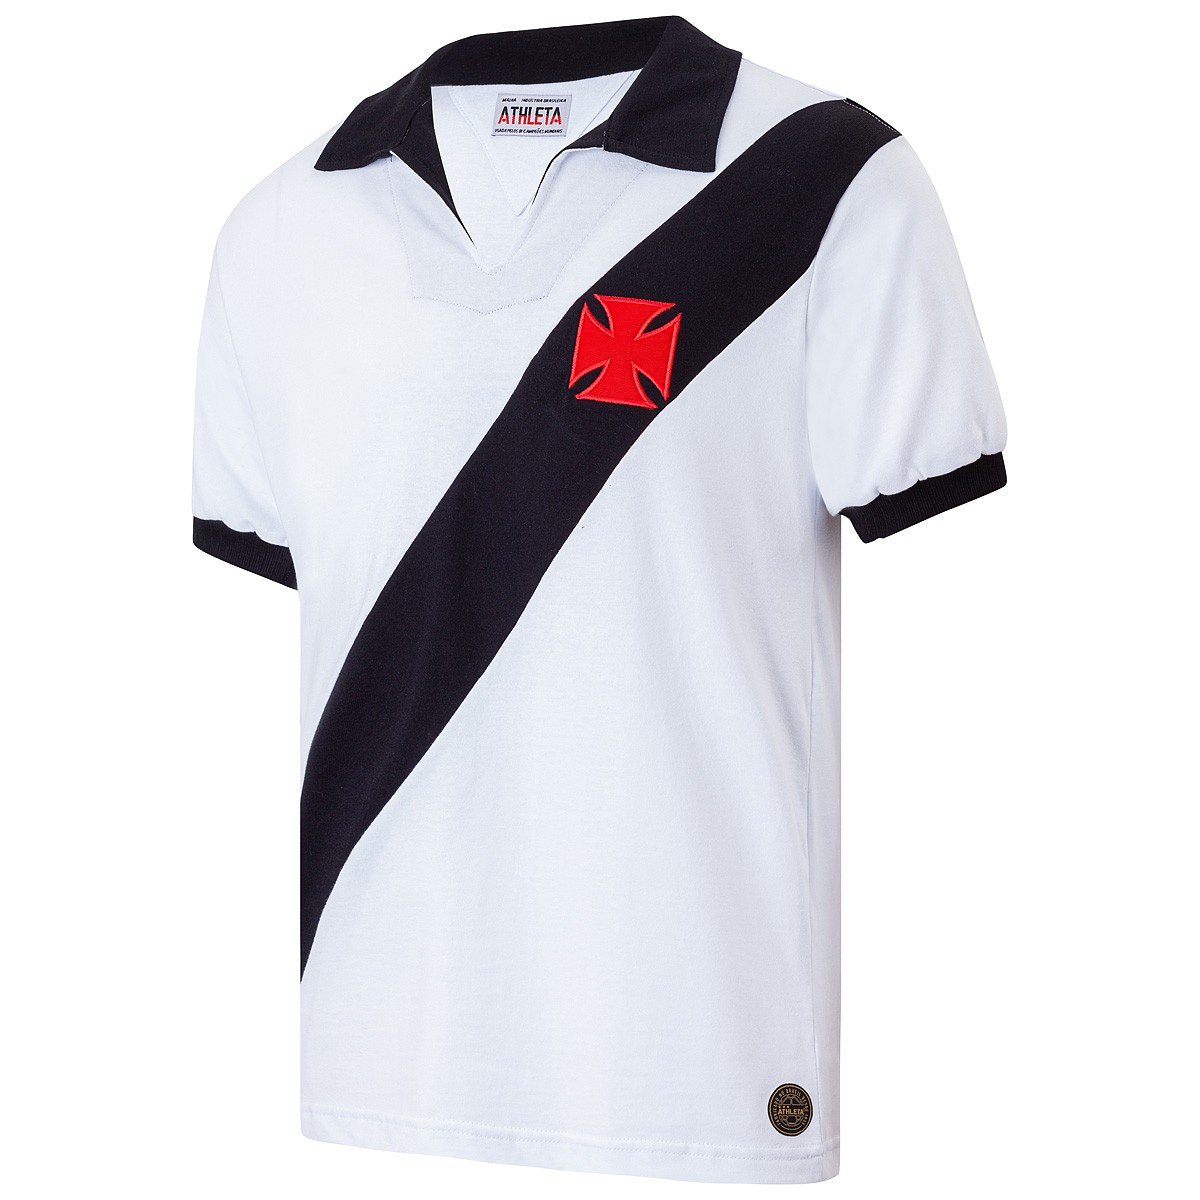 Camisa Vasco Retrô 1960 Branca Masculina